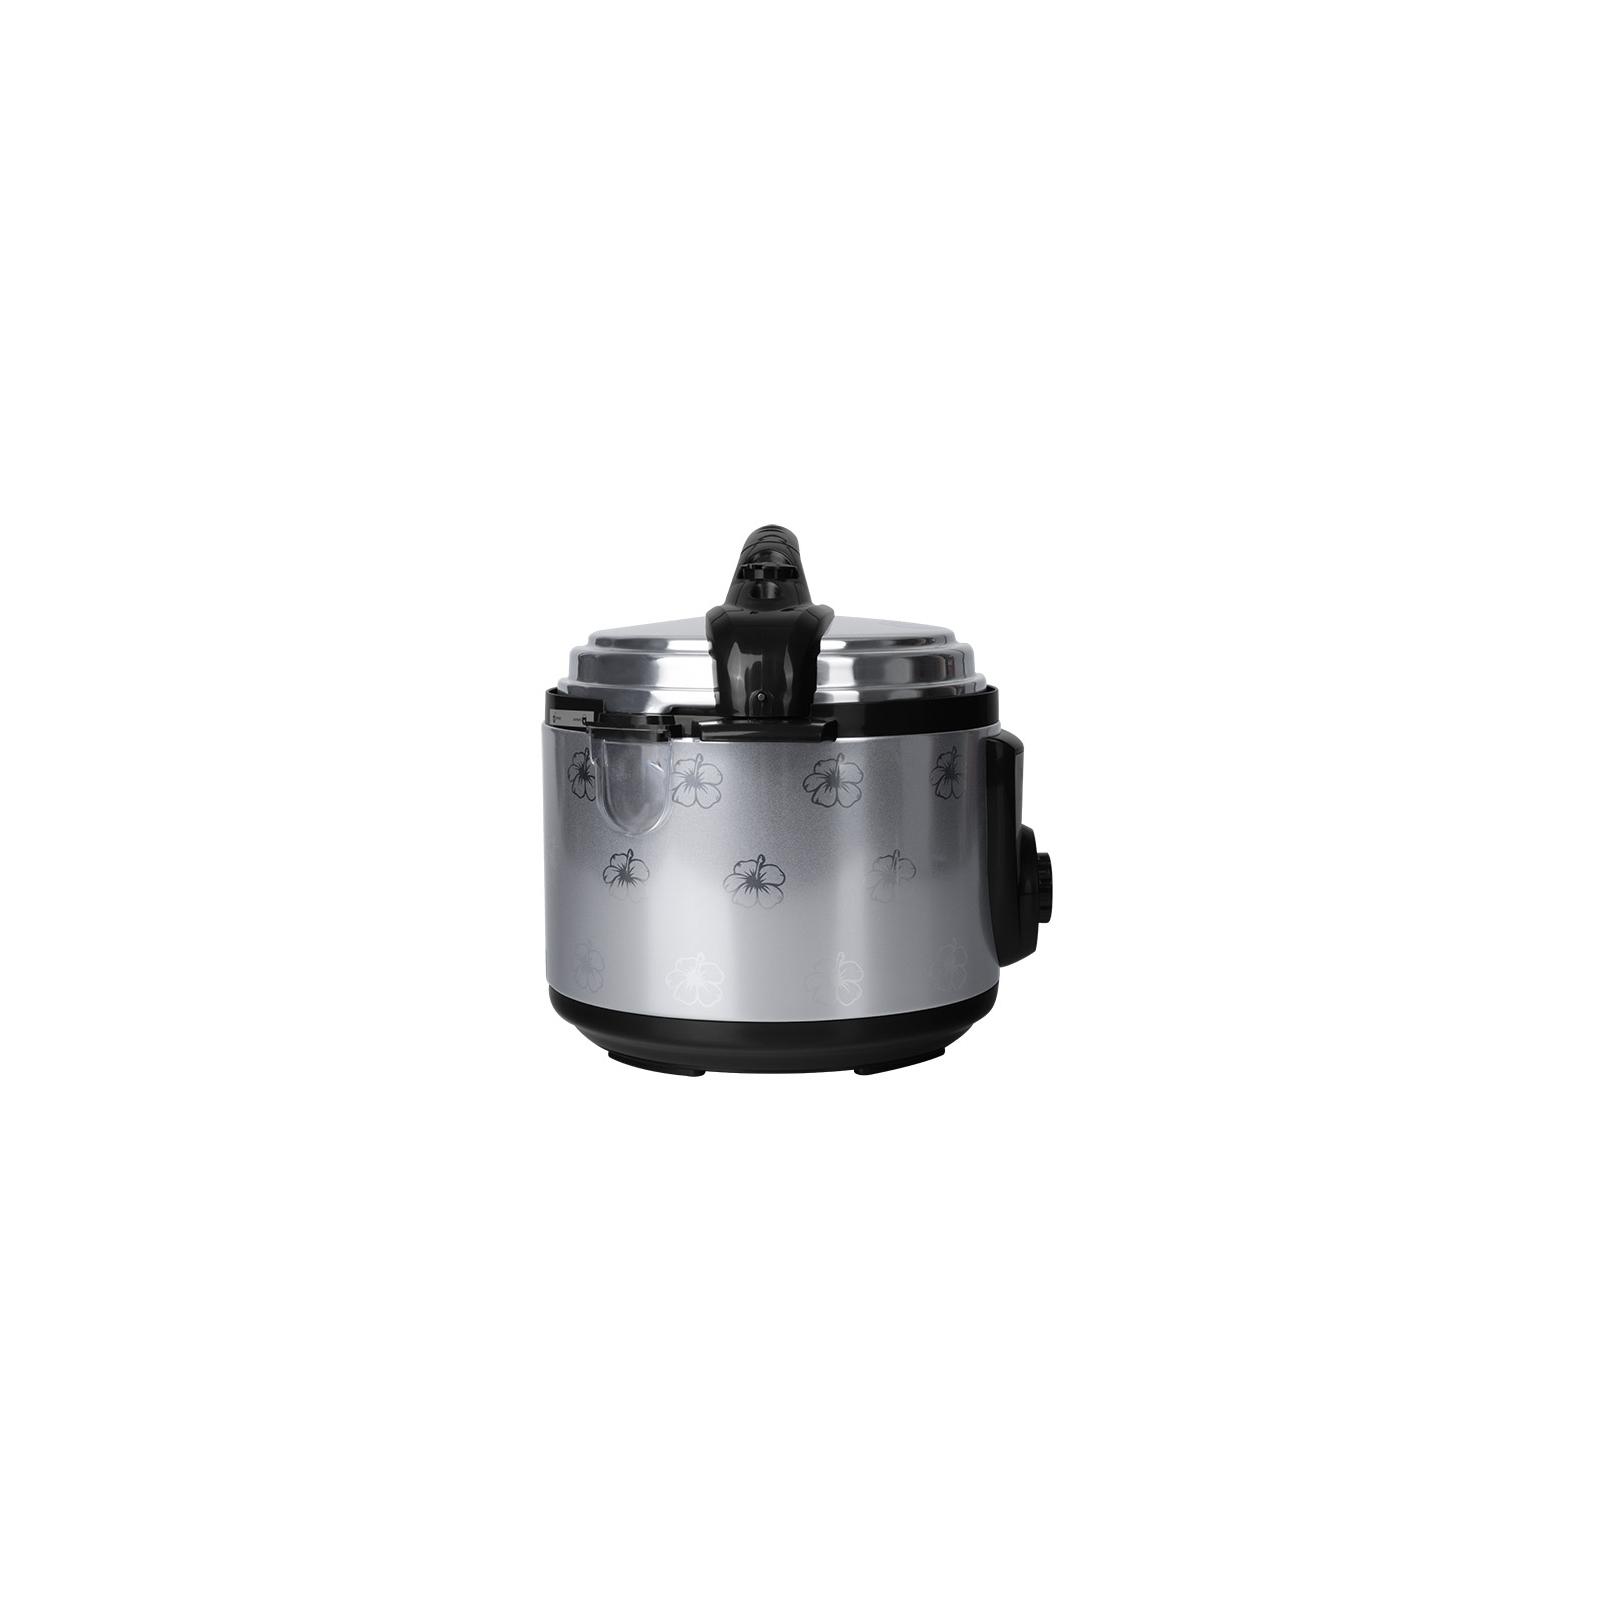 Мультиварка REDMOND RMC-PM4507 black изображение 5